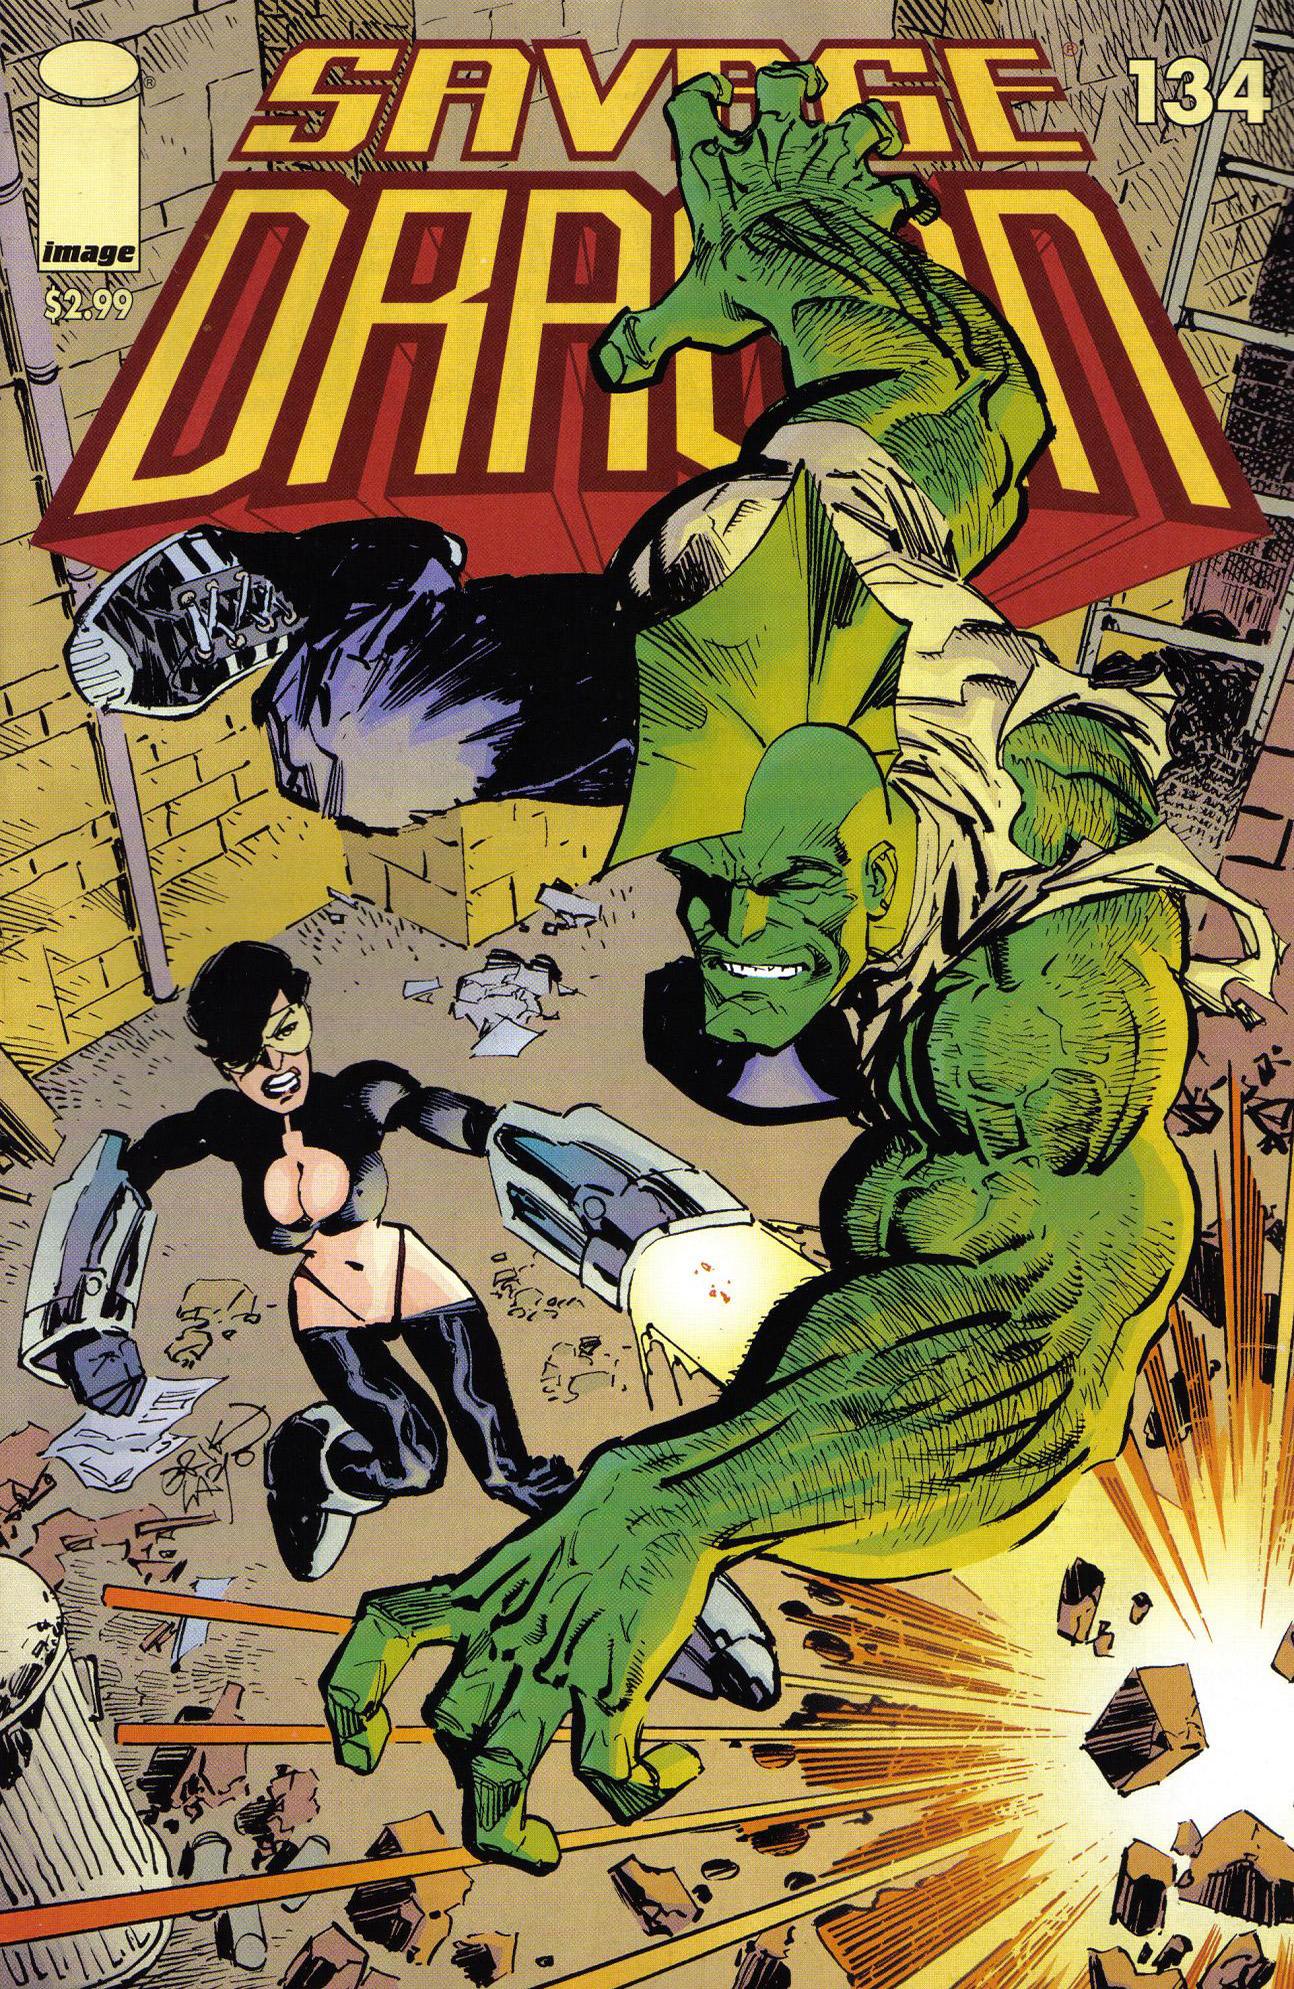 Cover Savage Dragon Vol.2 #134